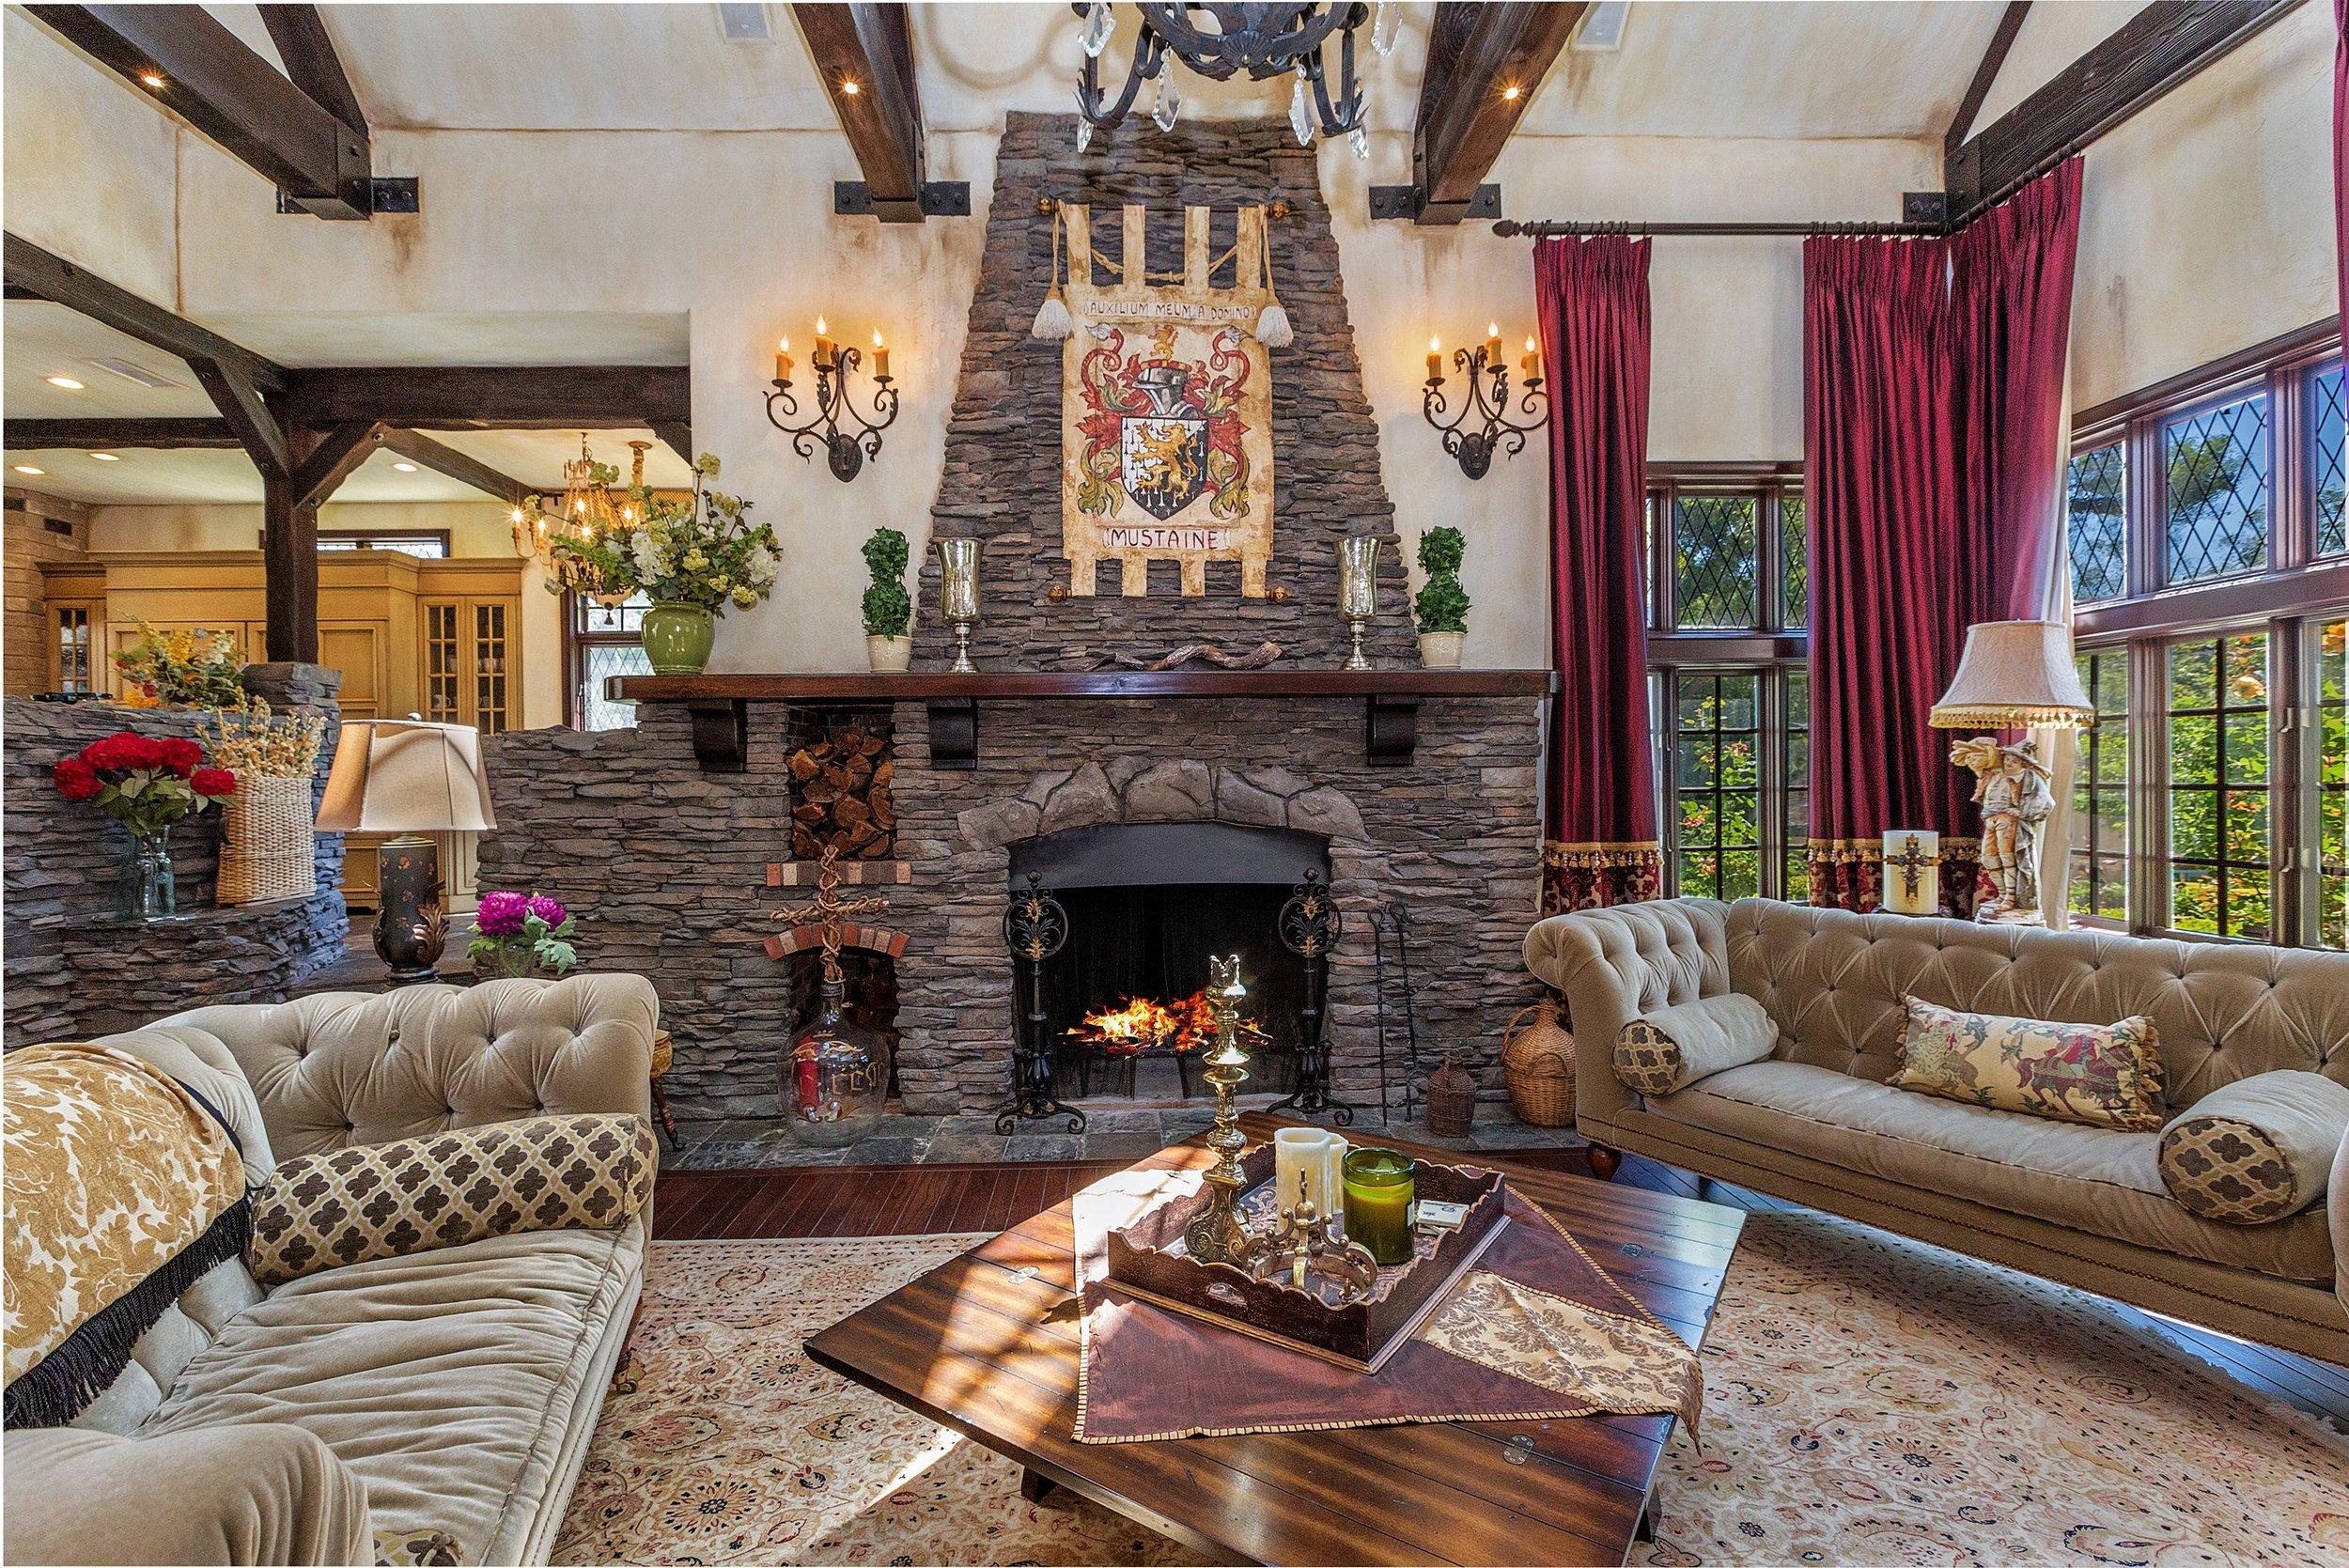 027_Living Room Fireplace.jpg